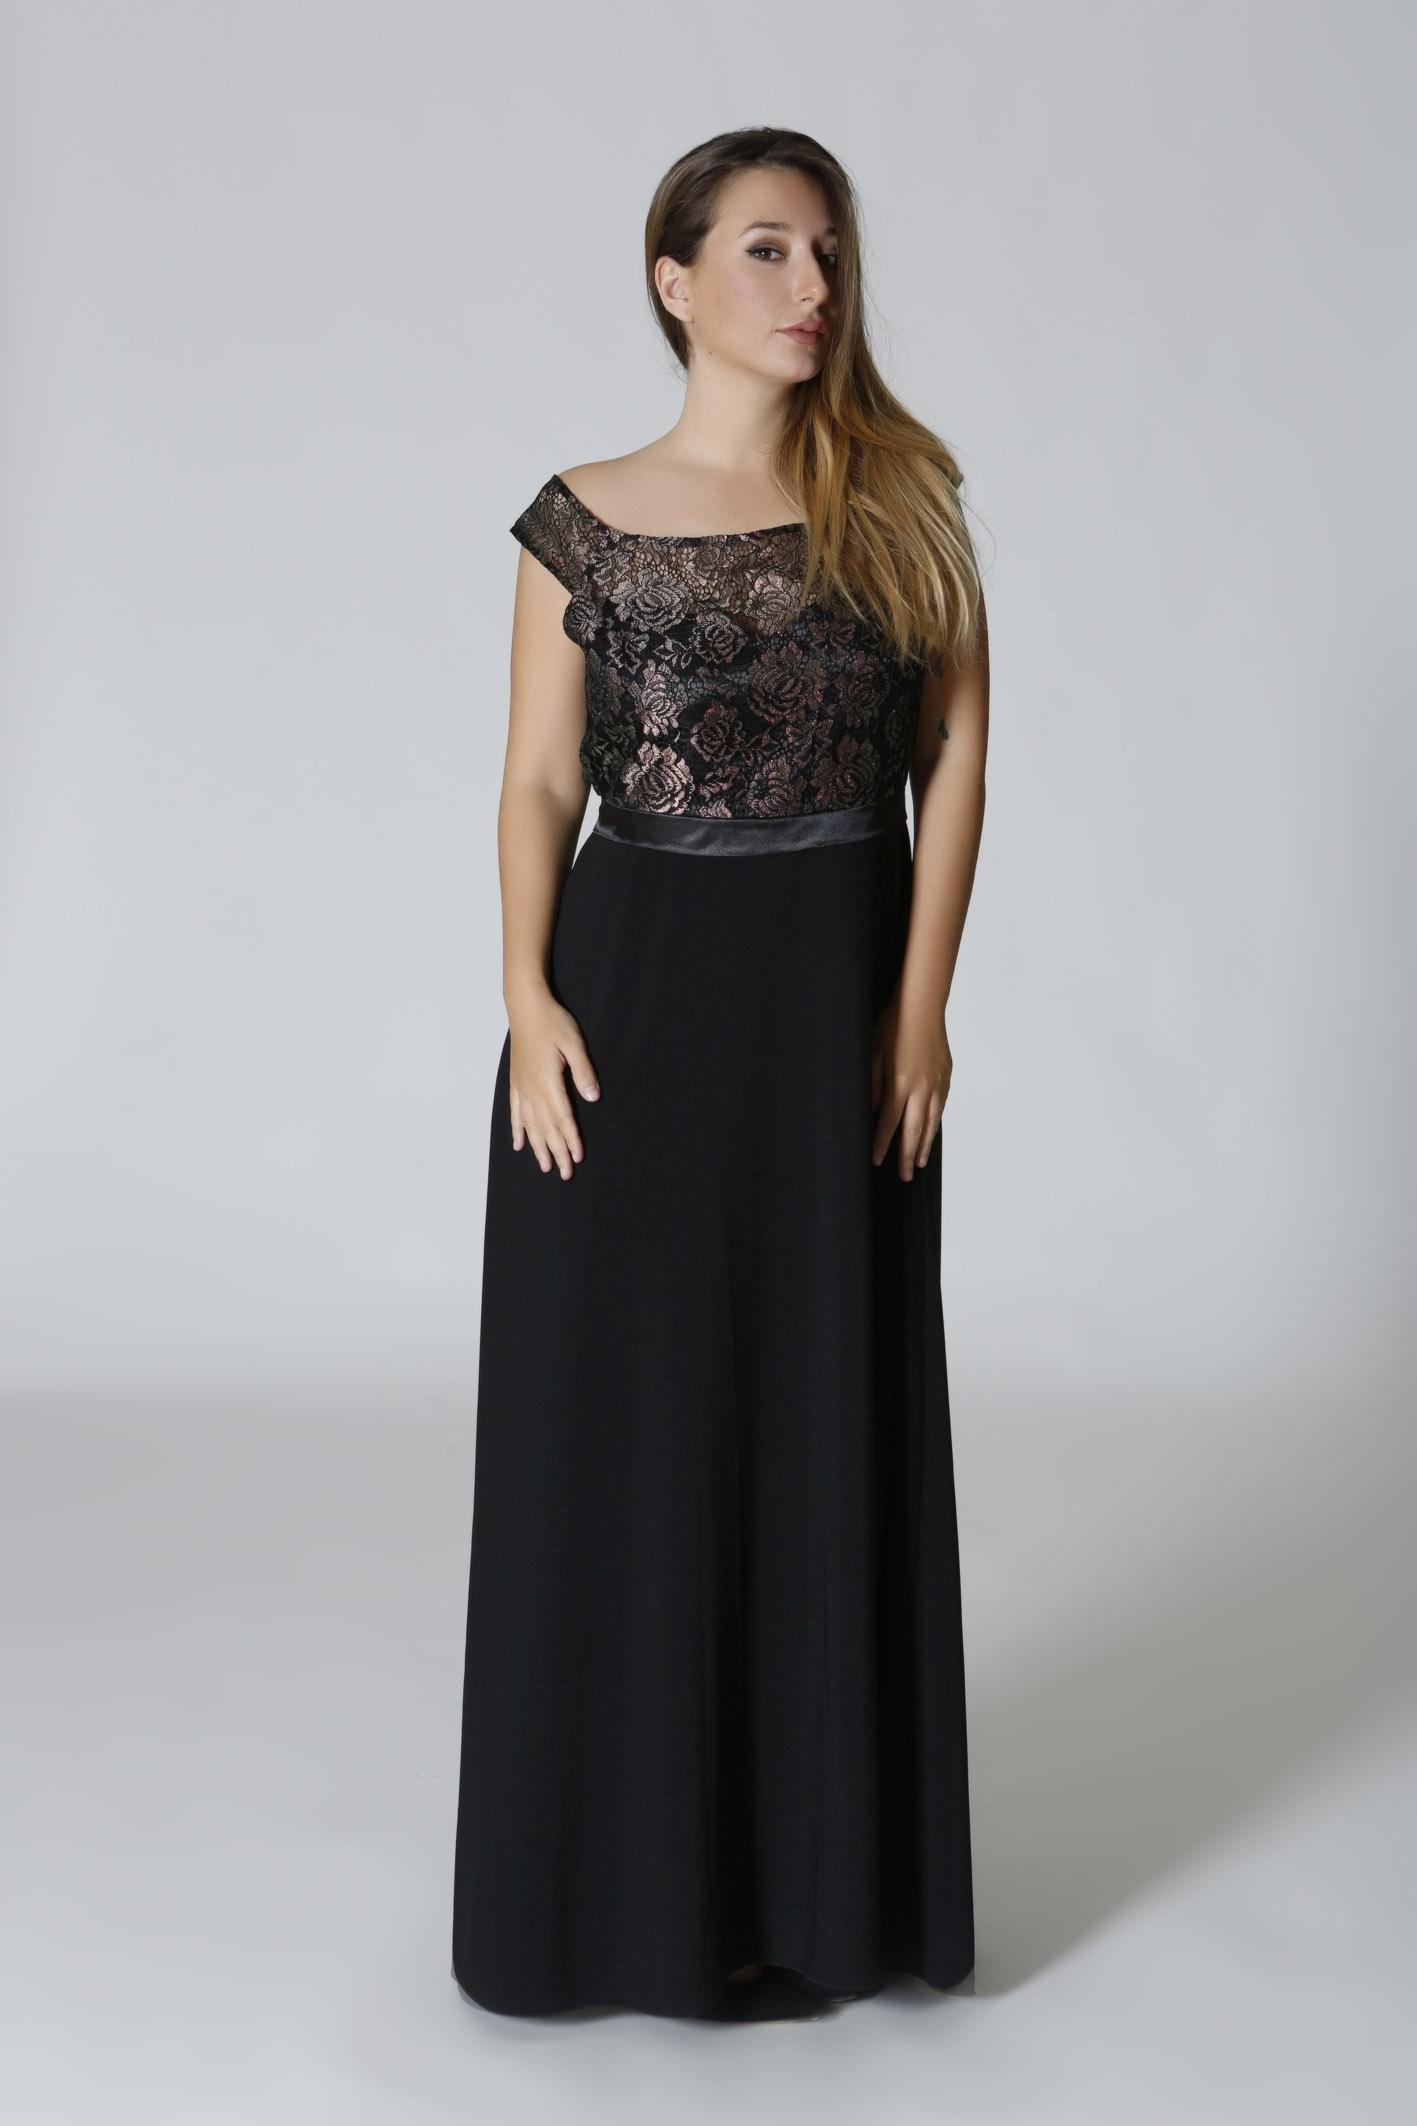 46718ff572ca Maxi φόρεμα δαντέλα μαύρο